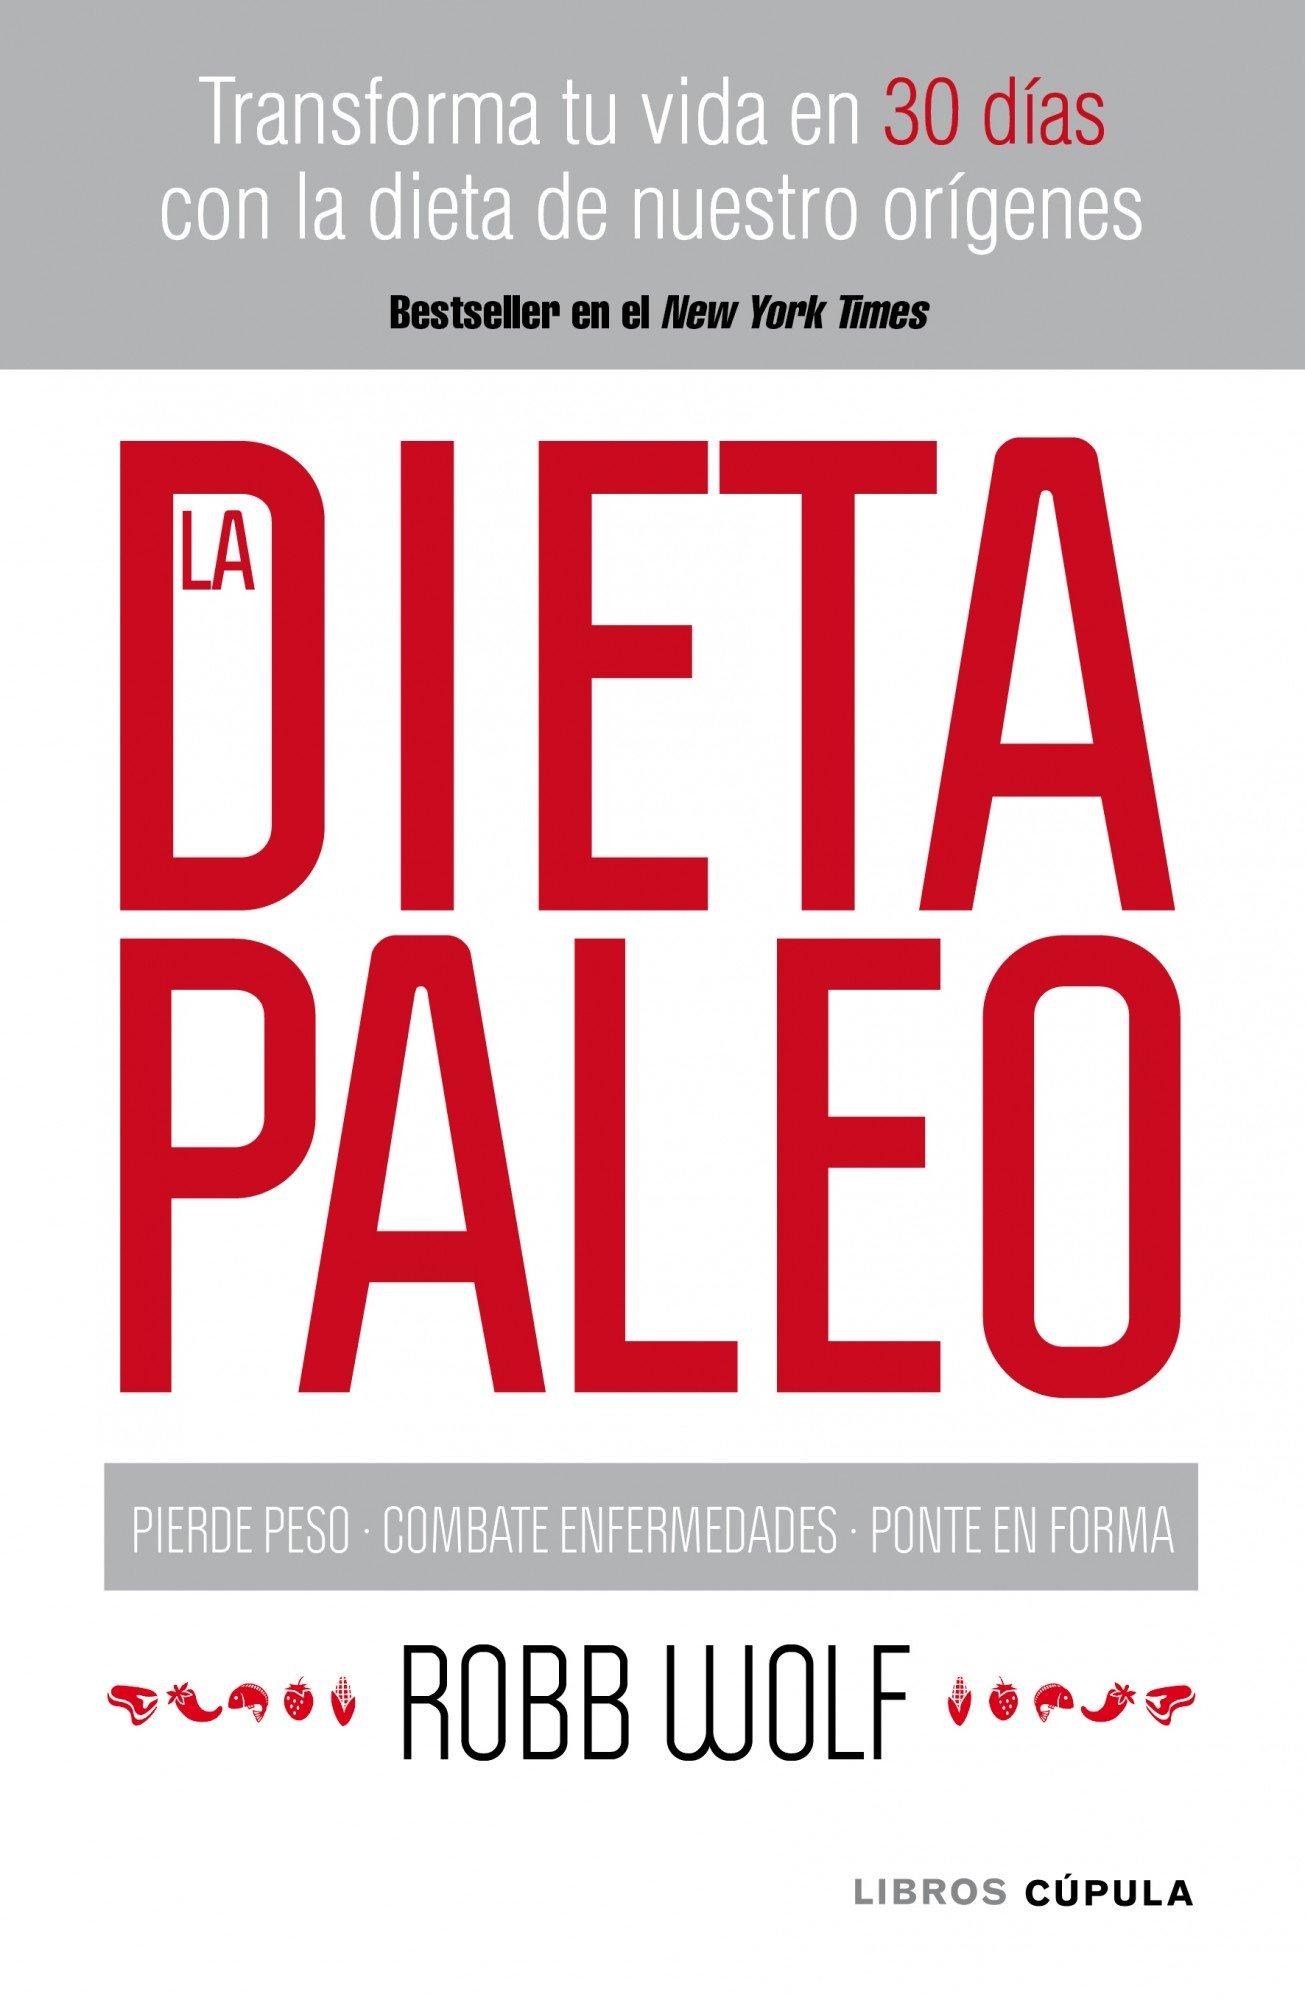 Robo Wolf Paleo dieta para bajar de peso